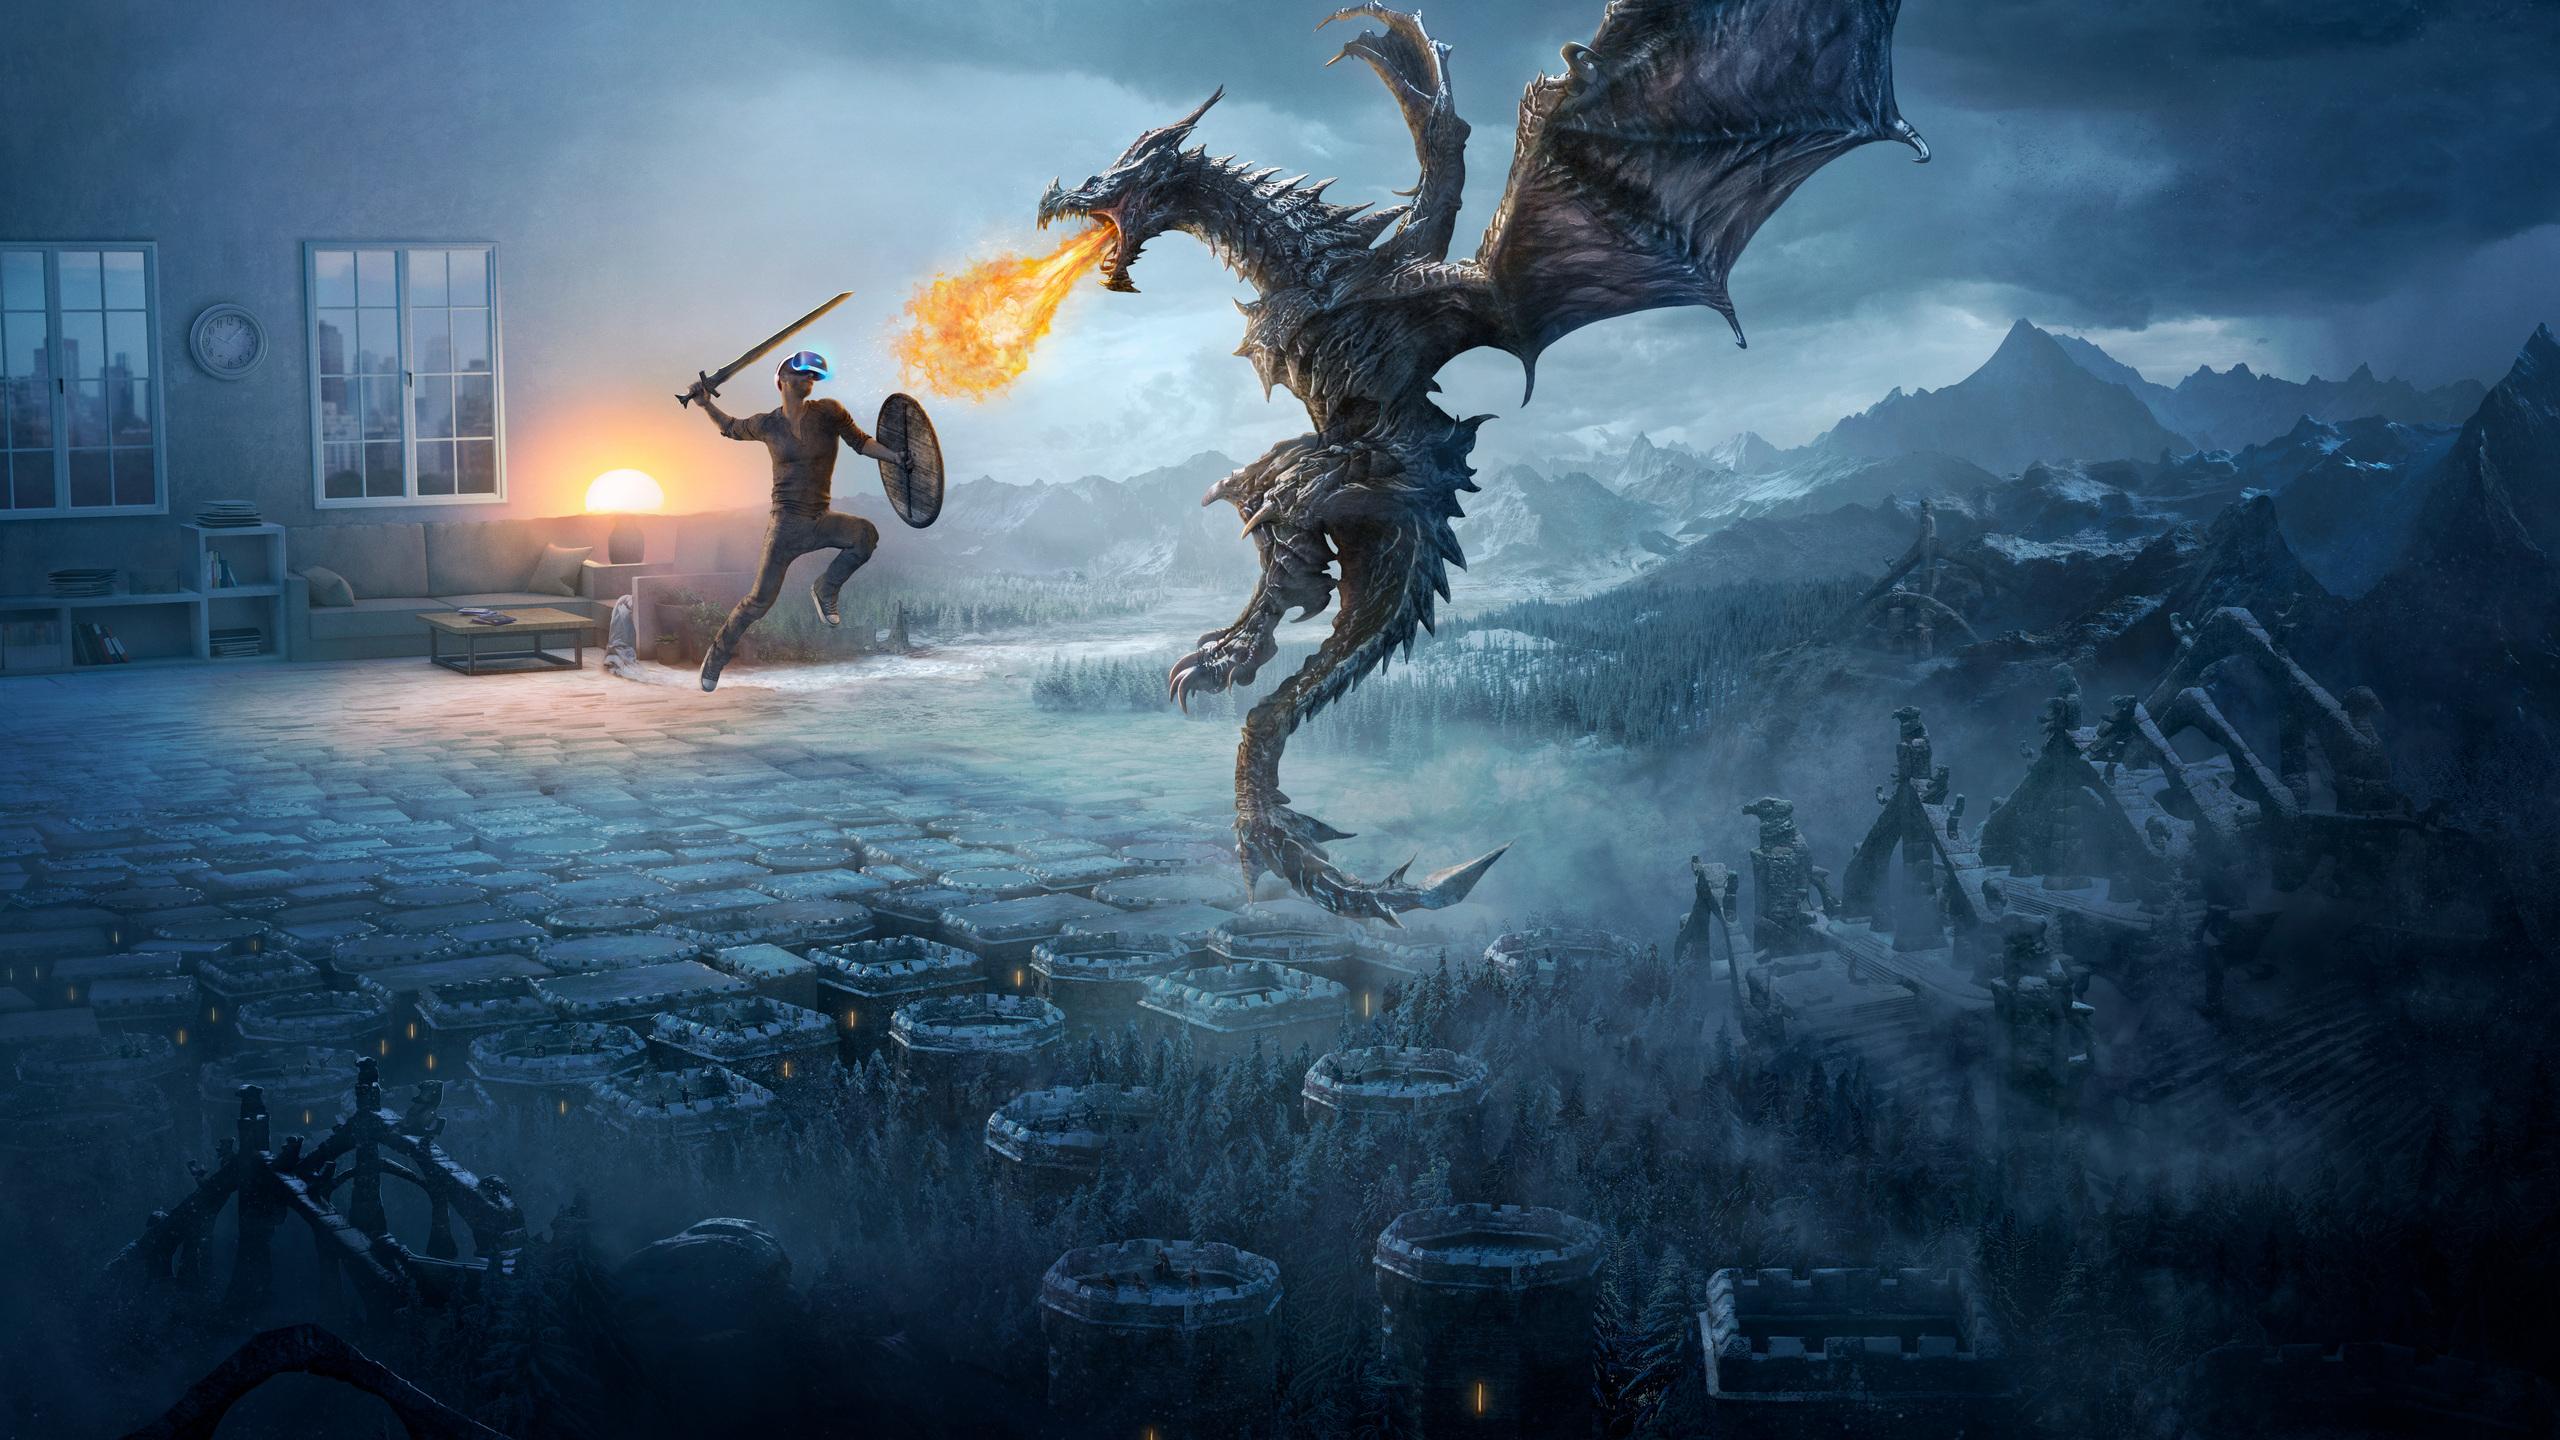 dragon-vs-vr-human-3m.jpg